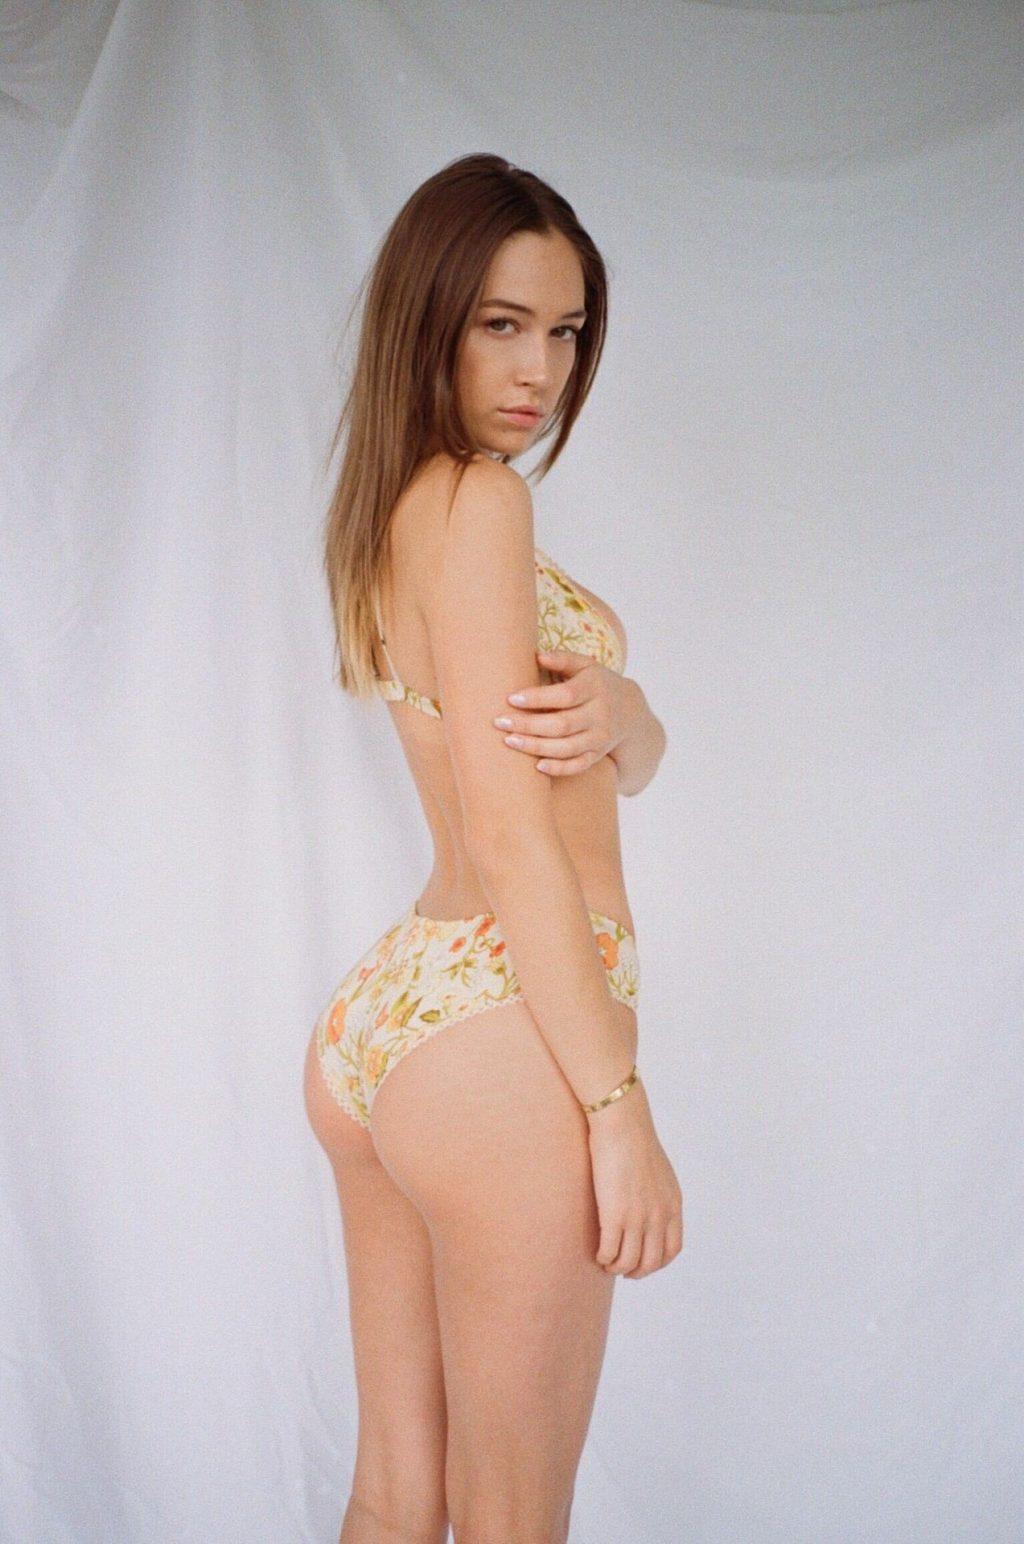 Elsie Hewitt Sexy (16 Photos)